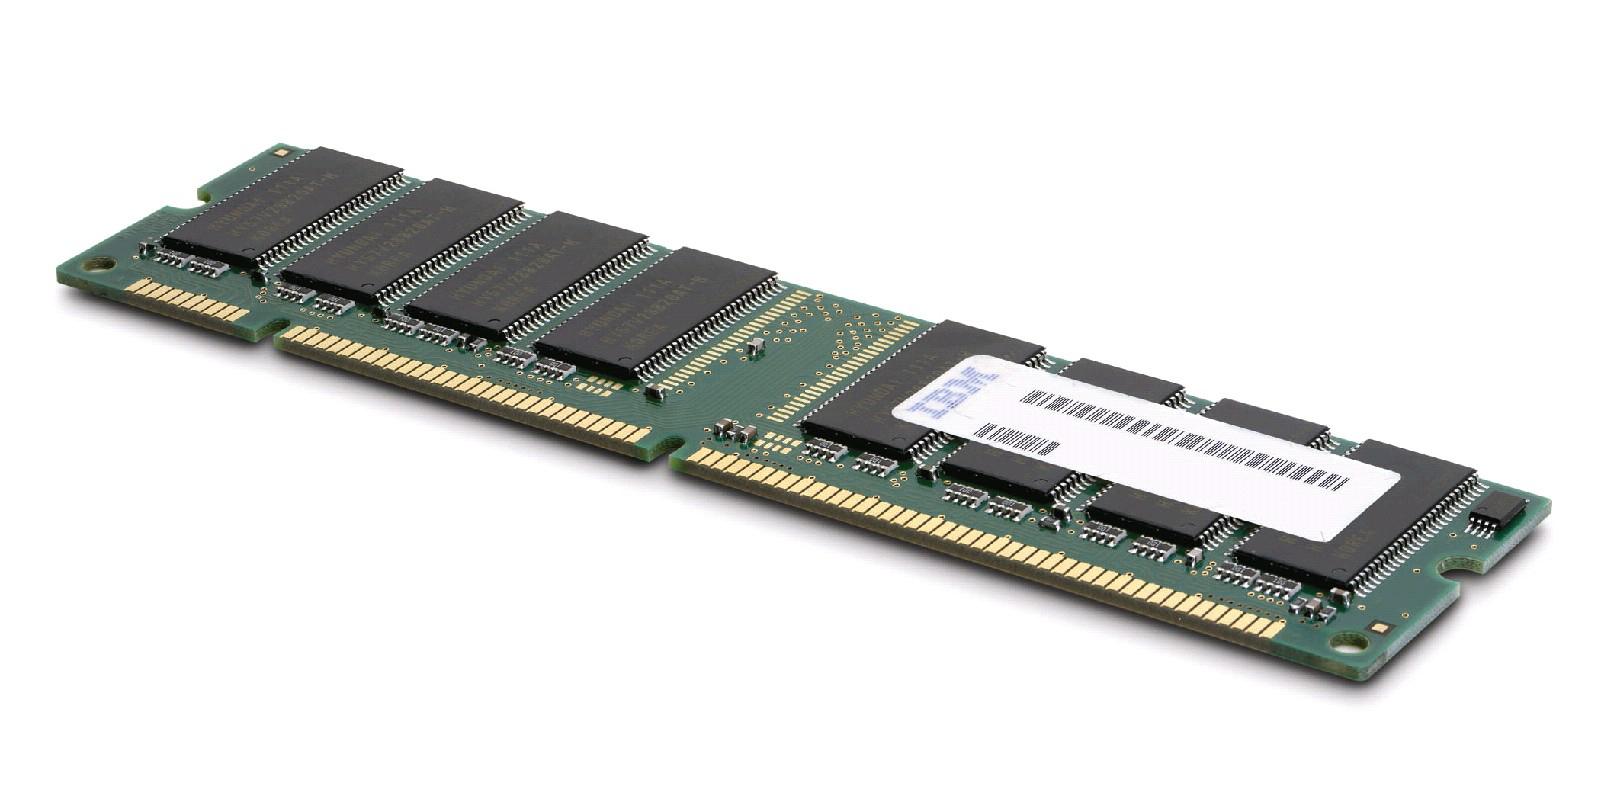 Lenovo 16GB PC3-12800 CL11 ECC DDR3 1600MHz VLP RDIMM (90Y3159) - REFURB